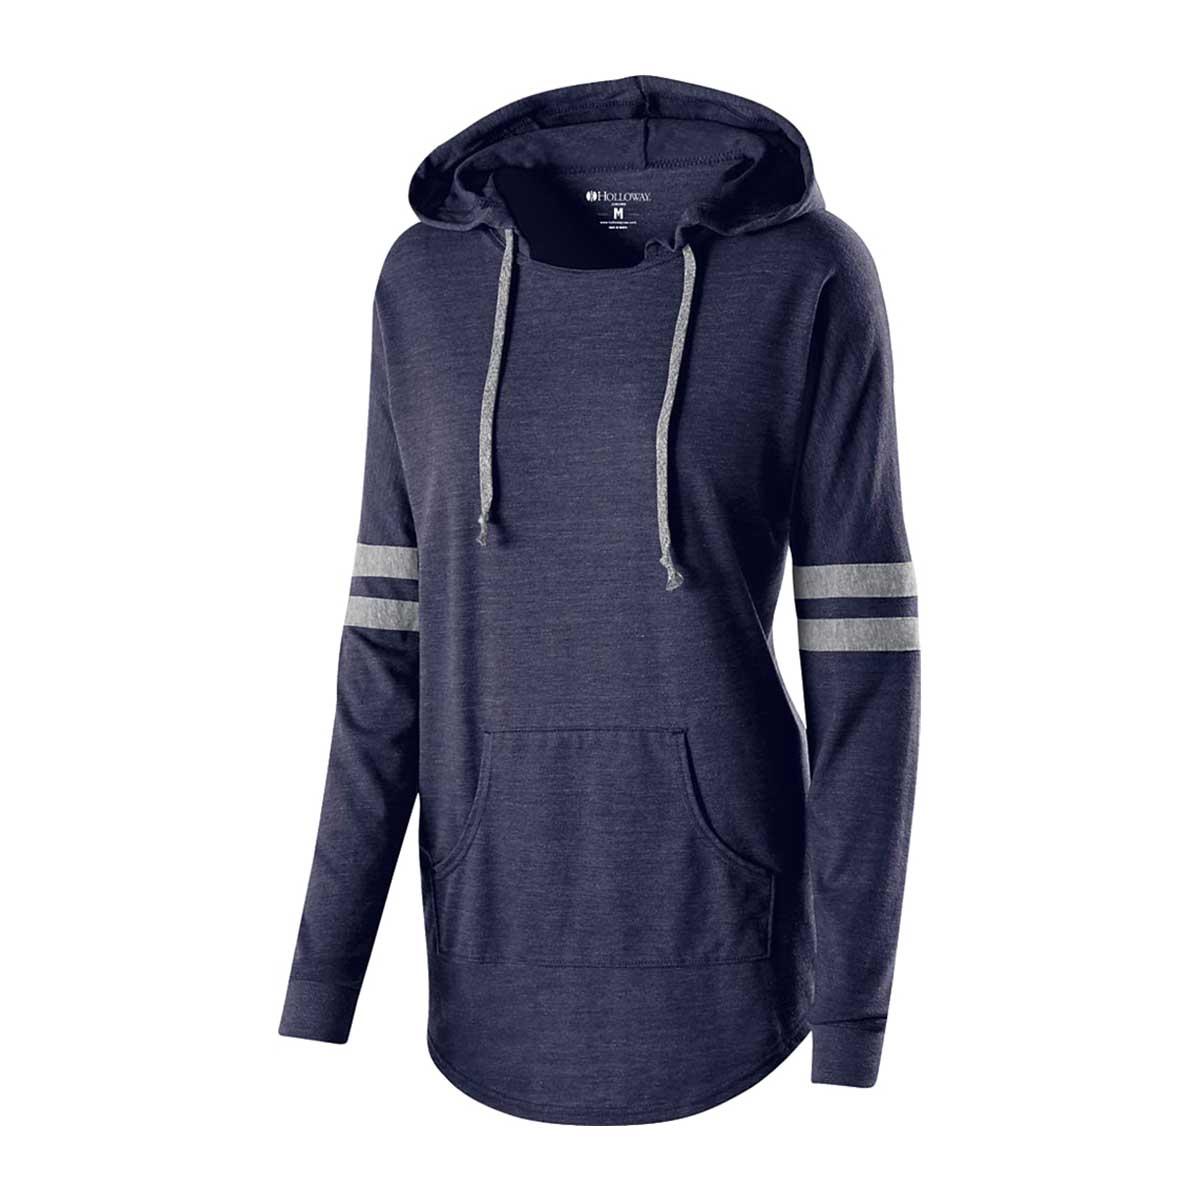 Navy ladies heather game day sweatshirt